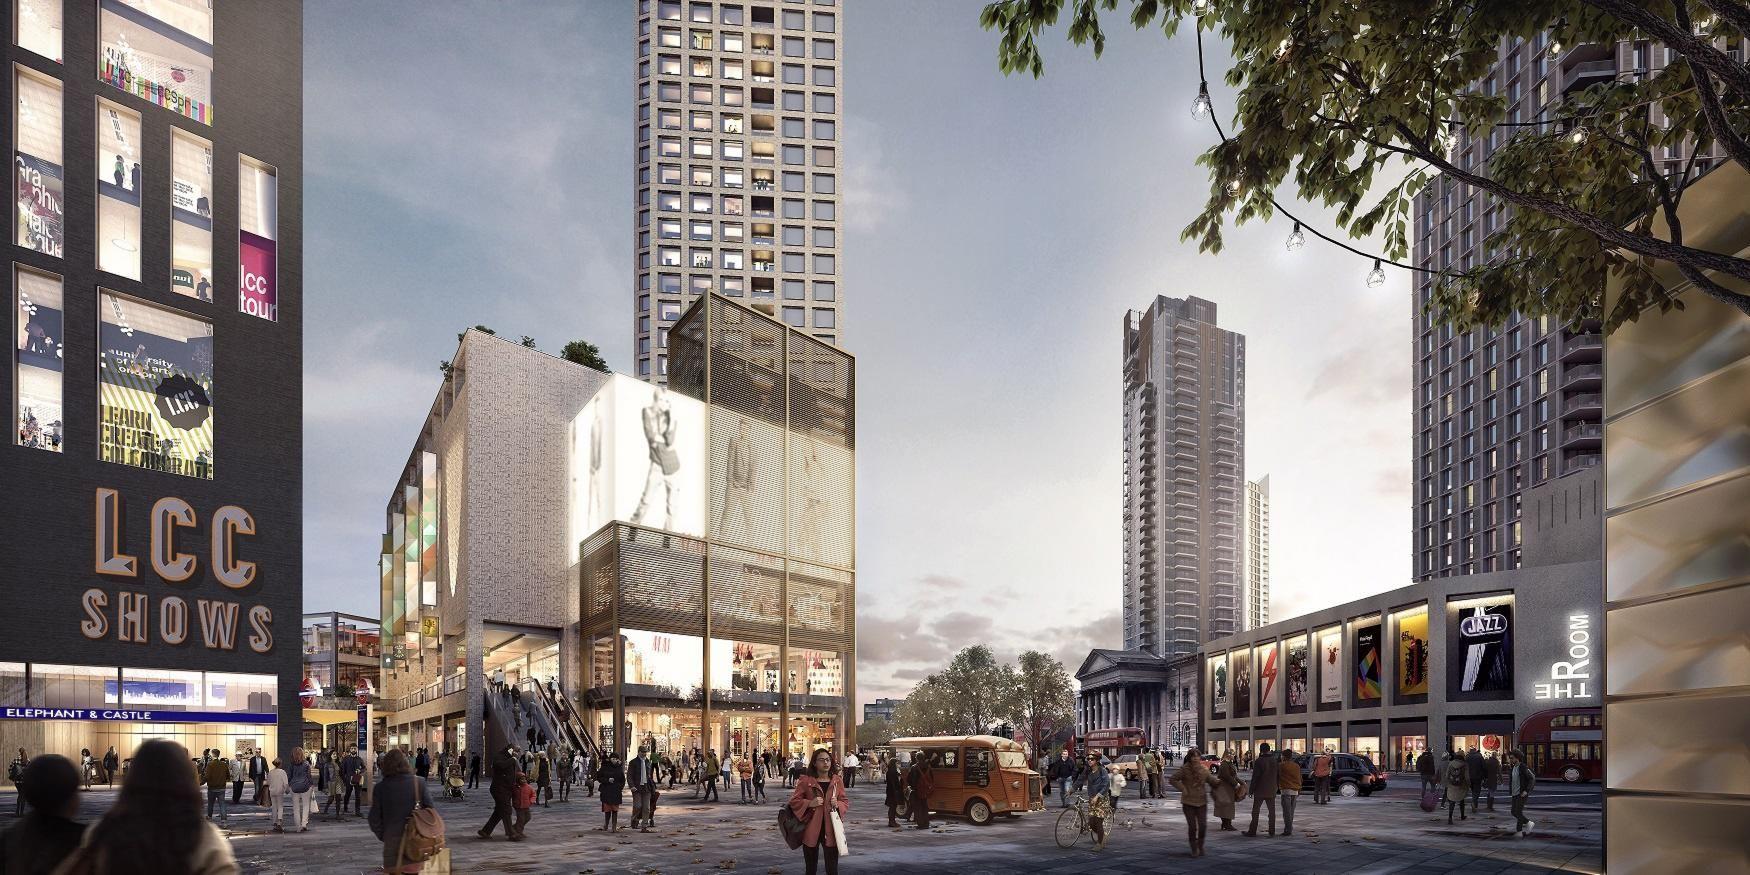 Green light for Elephant & Castle £3bn regeneration project